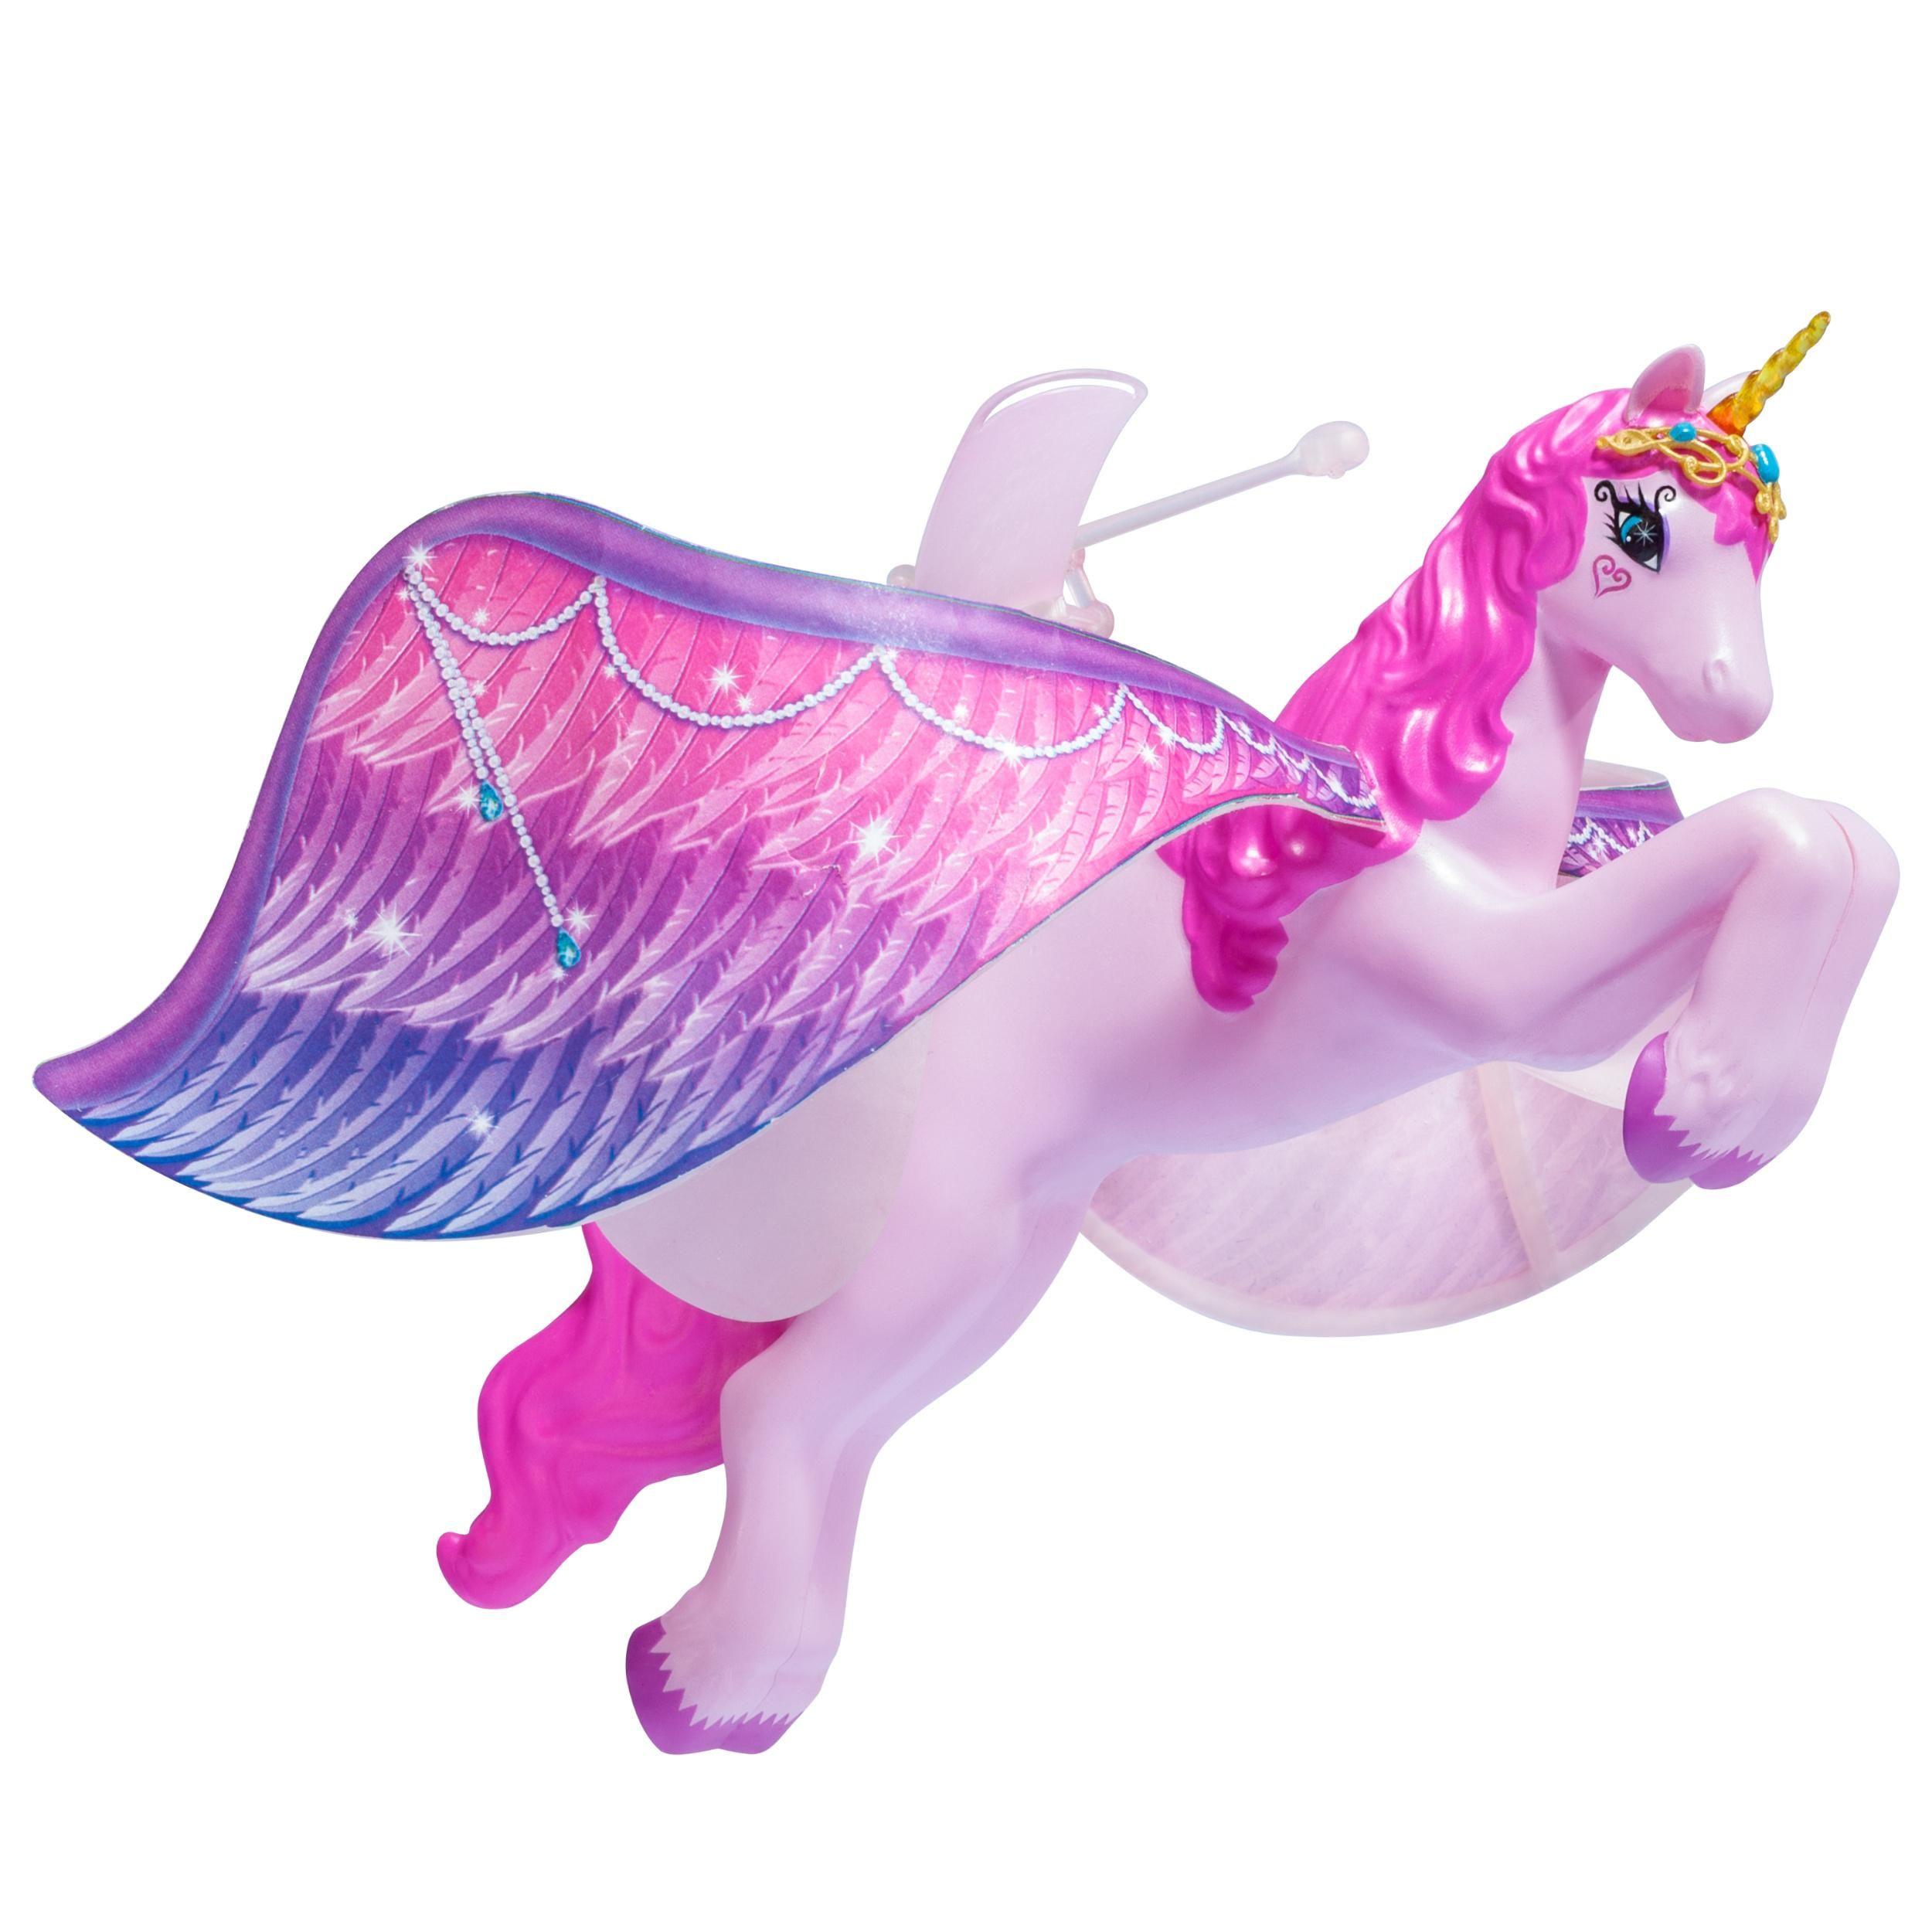 Robot Check Flying Unicorn Unicorn Kid Toys